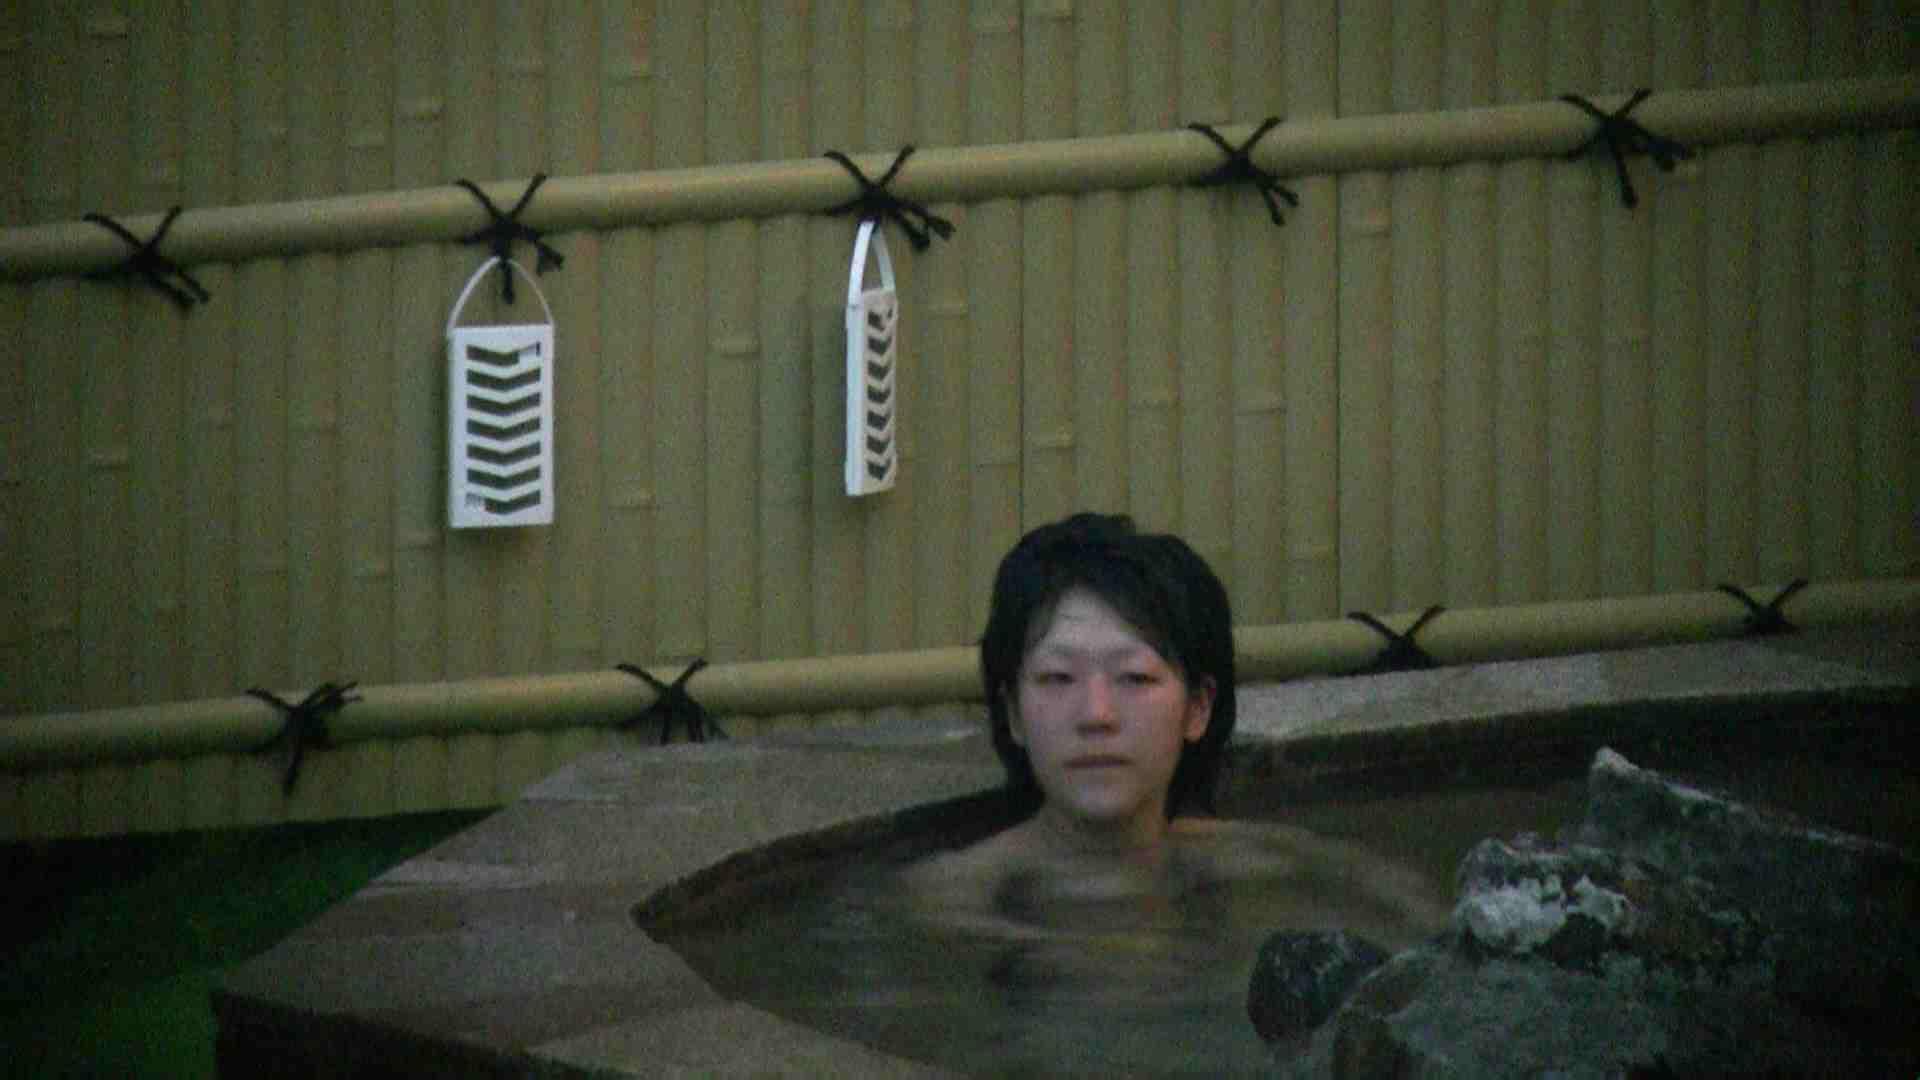 Aquaな露天風呂Vol.05【VIP】 露天風呂編  112PIX 52